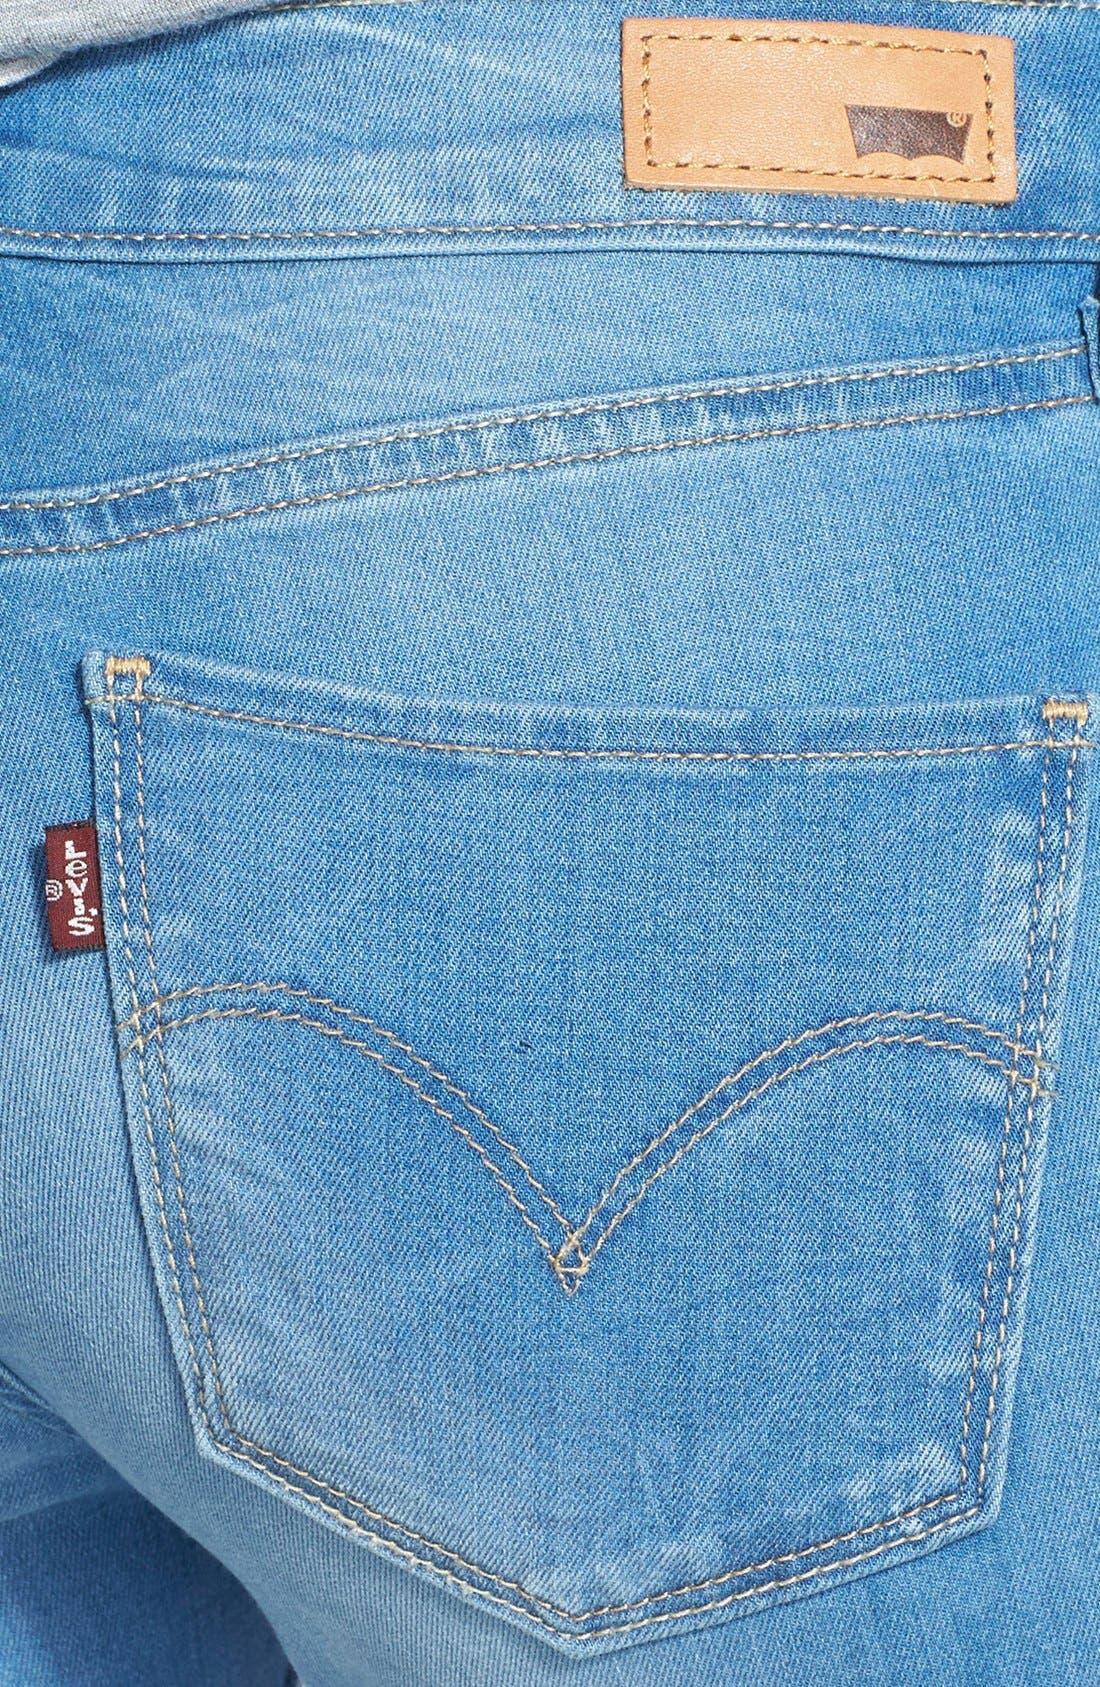 Alternate Image 3  - Levi's® Super Skinny Jeans (Indigo)